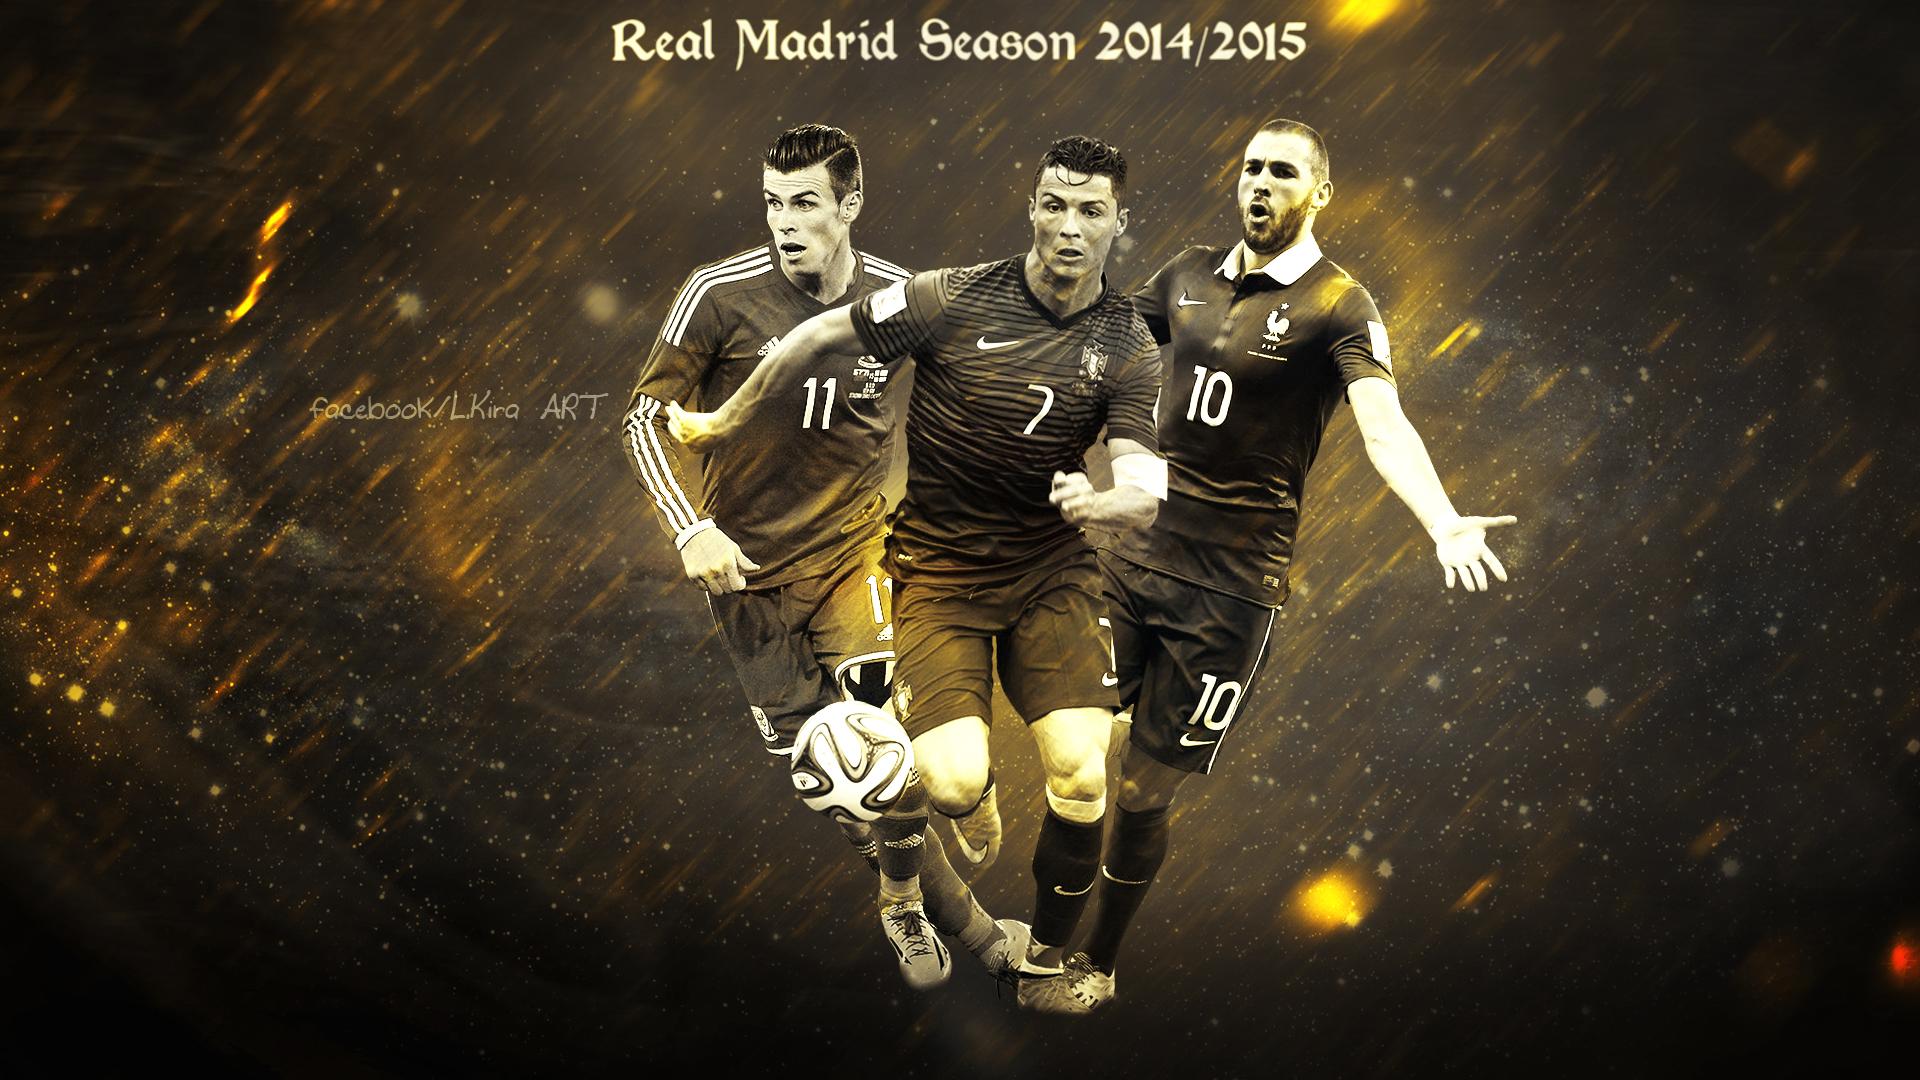 48] Real Madrid Wallpaper 2014 2015 on WallpaperSafari 1920x1080